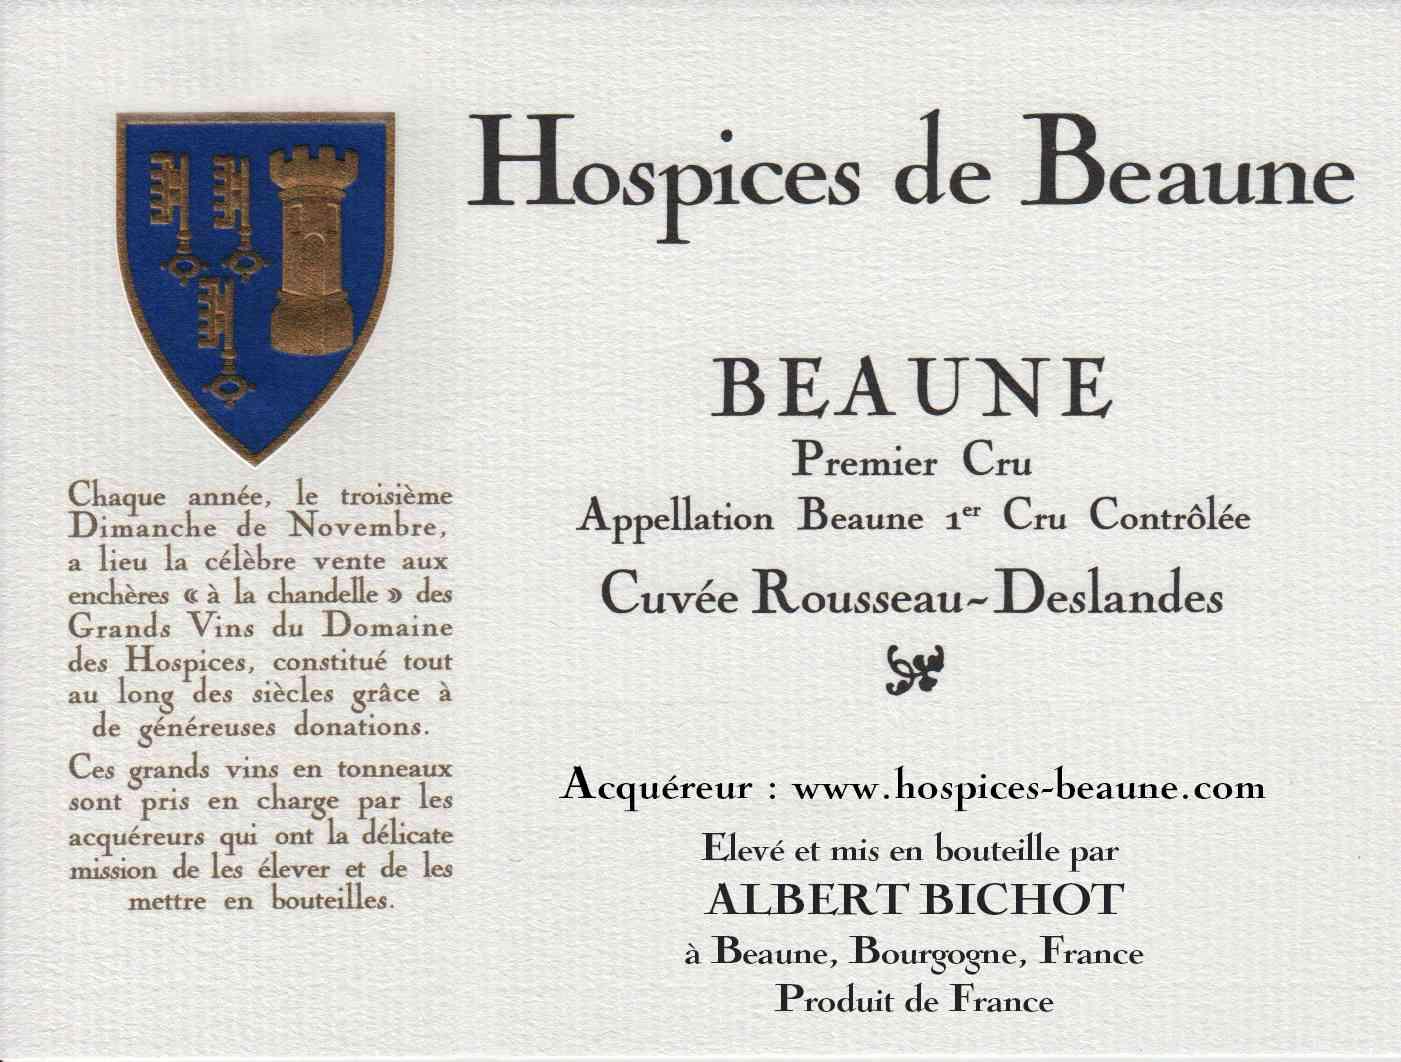 Encheres-auction-HospicesdeBeaune-AlbertBichot-Beaune1erCru-Cuvee-RousseauDeslandes